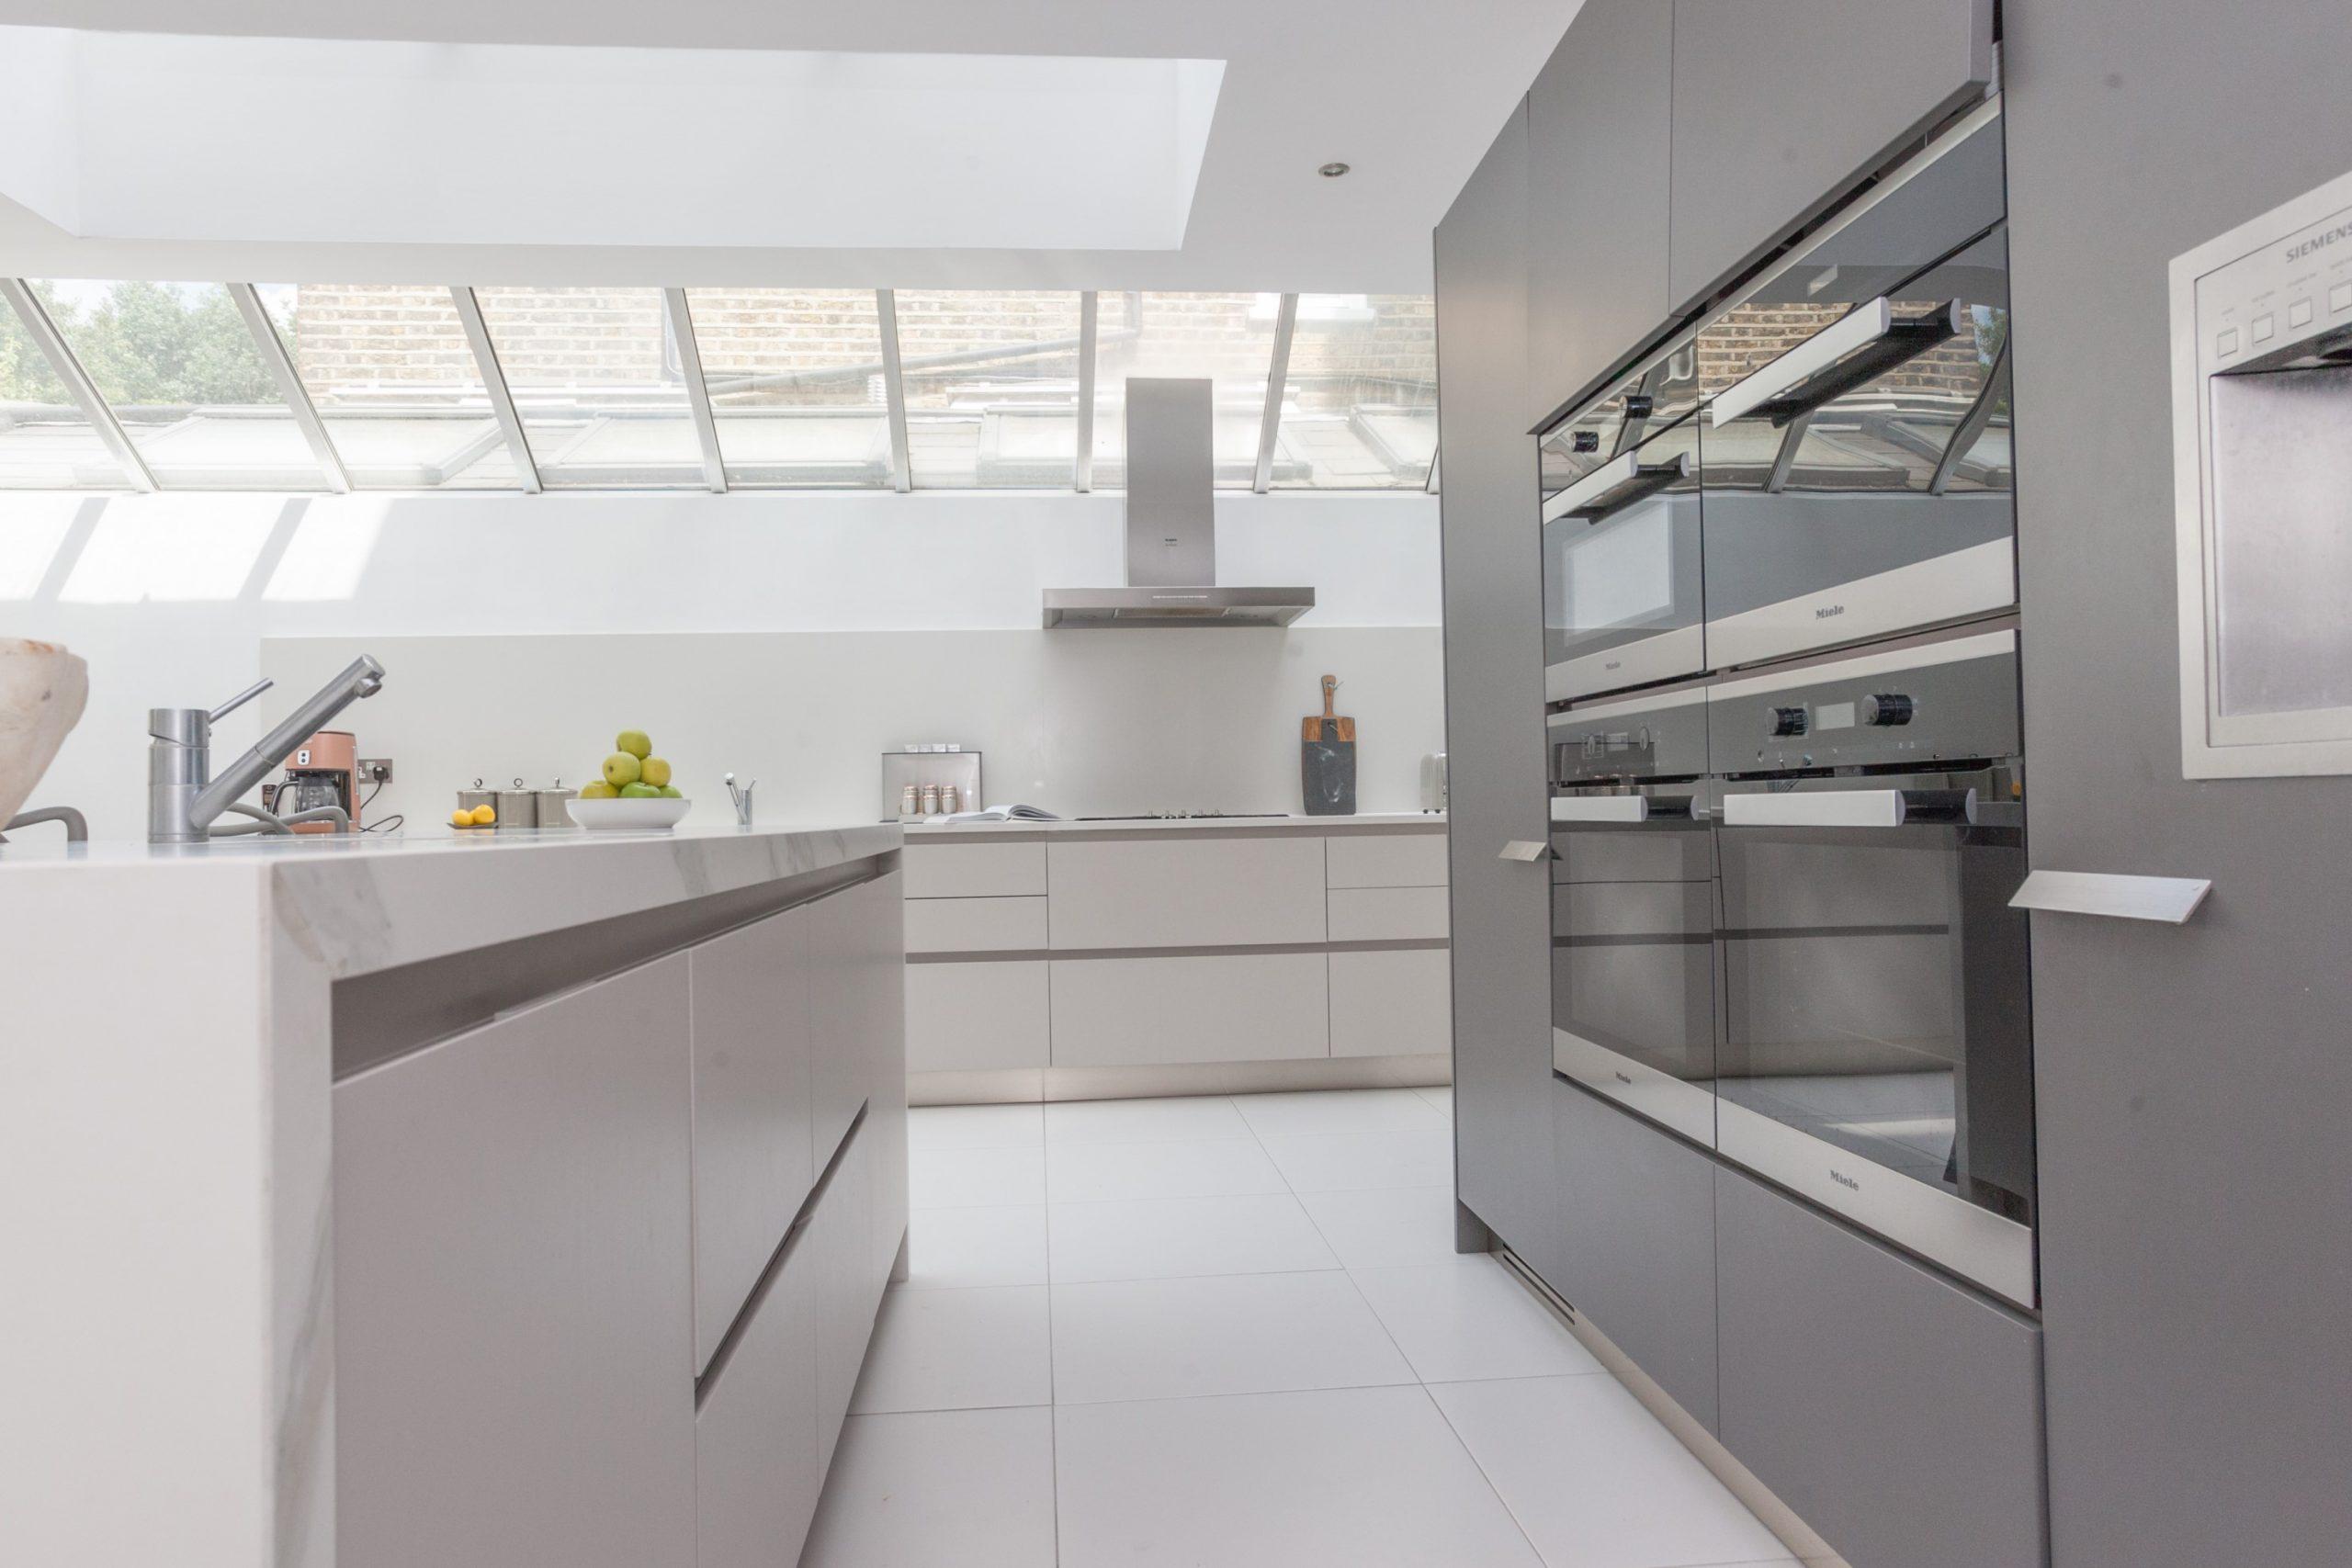 rjv-home-design-refurbishment-london-5f2136a5b72a8